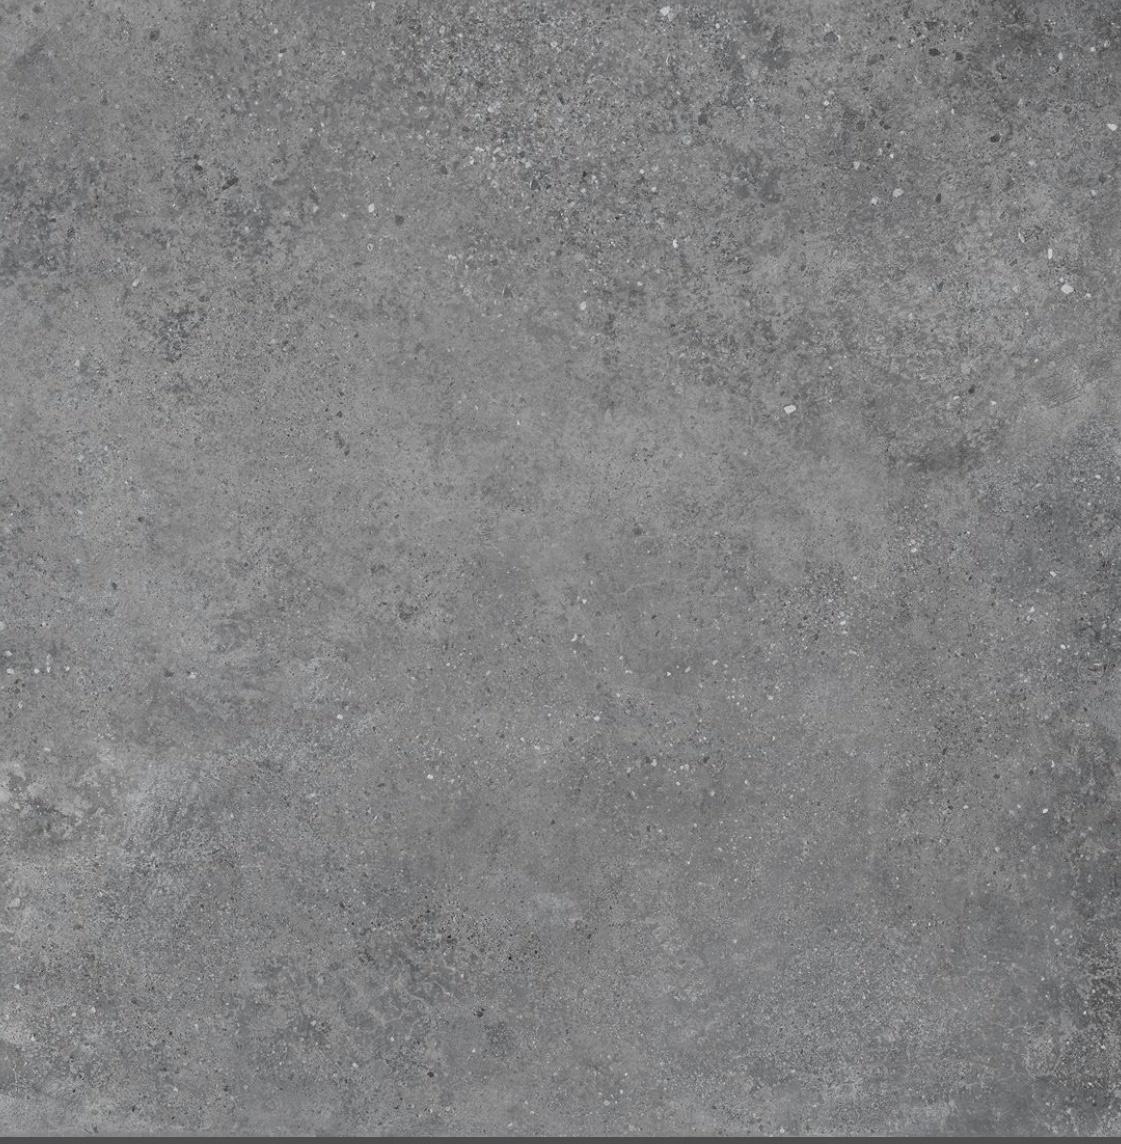 luxury tiles elizabeth dark grey stone grey outdoor tile 600x600x20mm